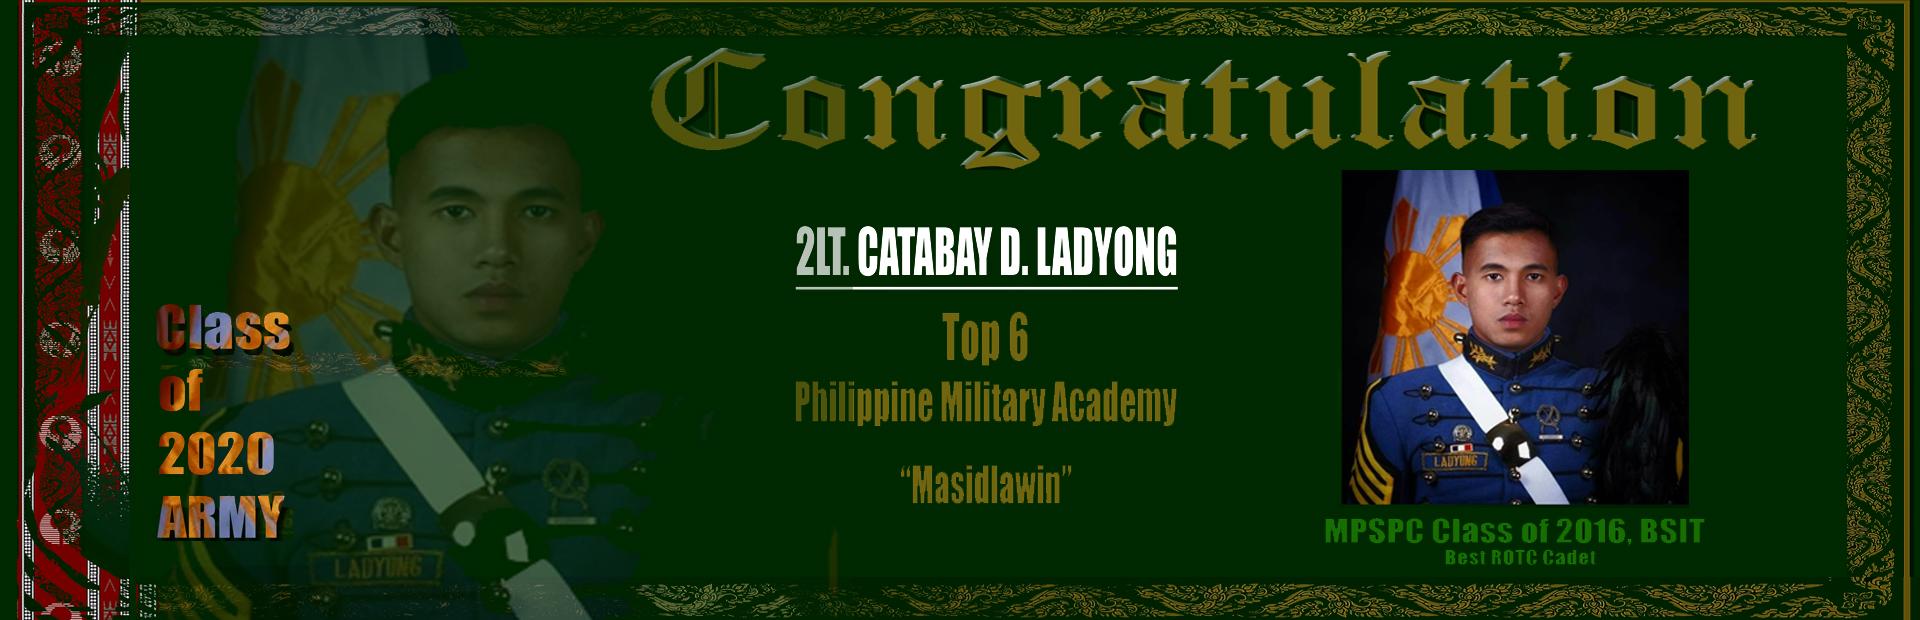 Congratulation - 2LT. CATABAY D. LADYON